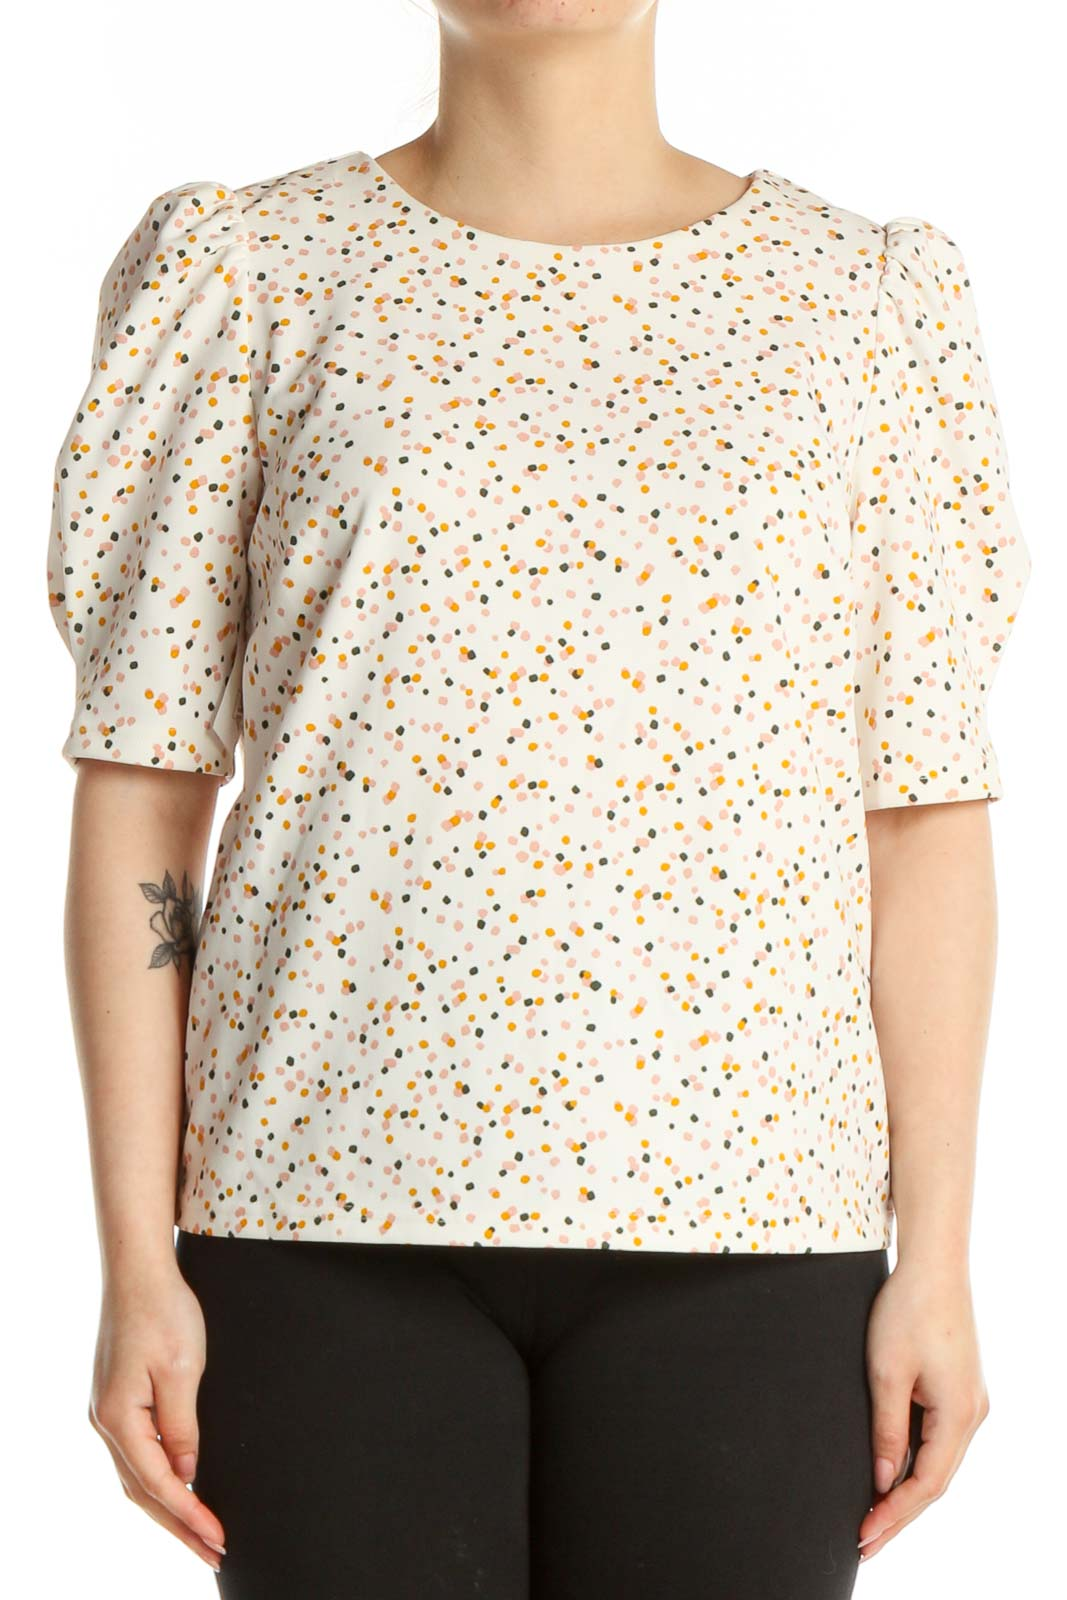 White Polka Dot Casual T-Shirt Front